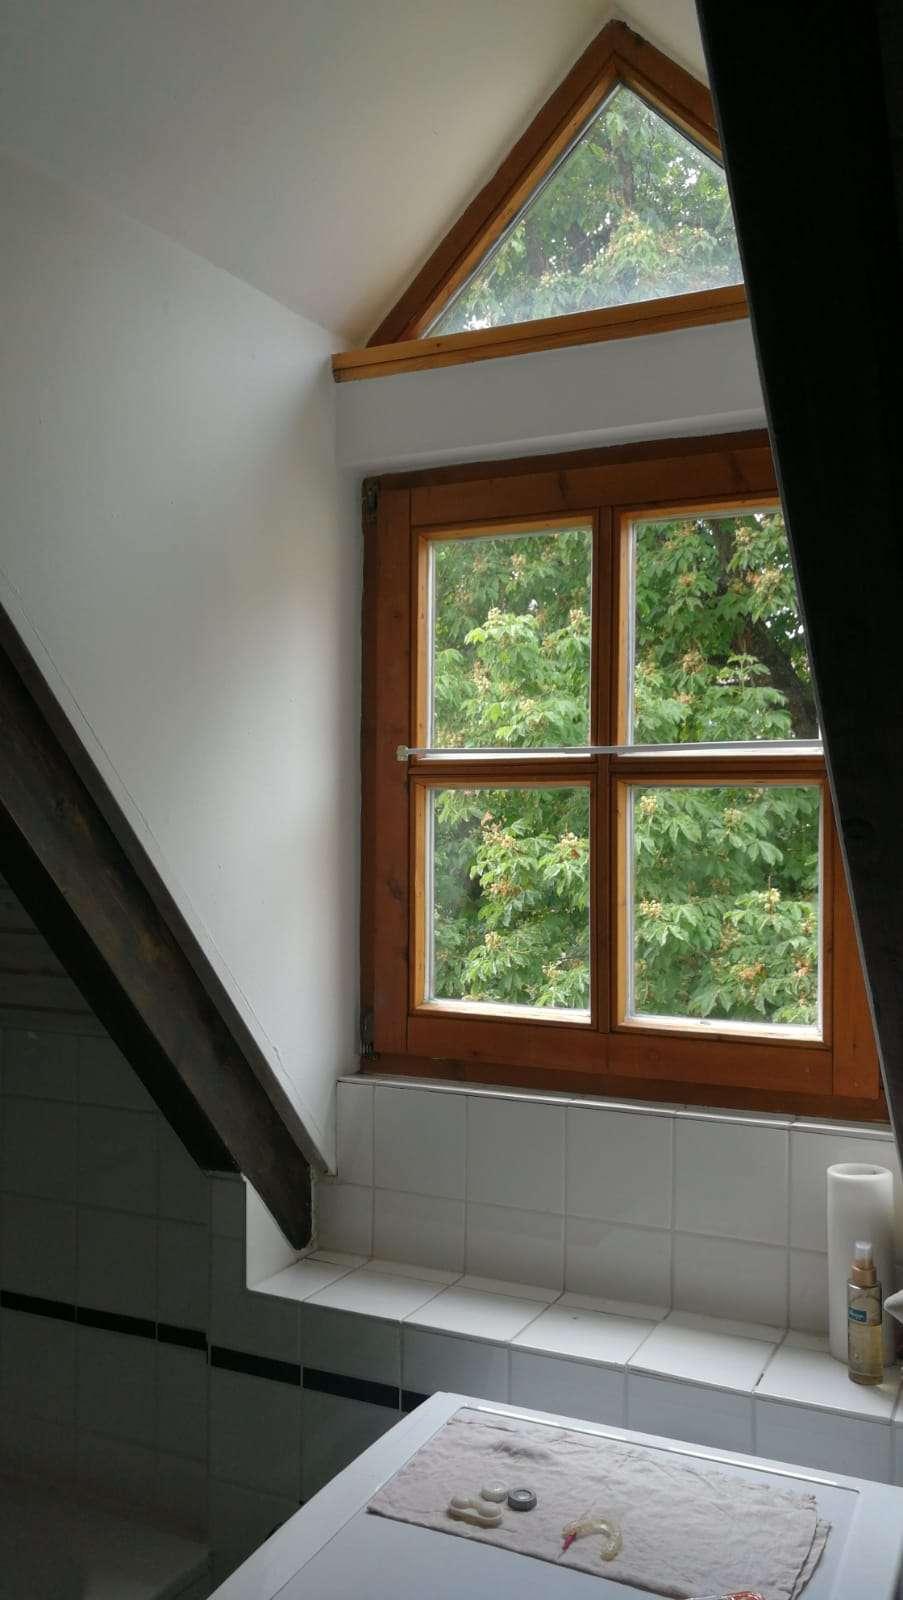 Geräumige Zwei-Zimmer-Wohnung in Regensburg / Altstadt in